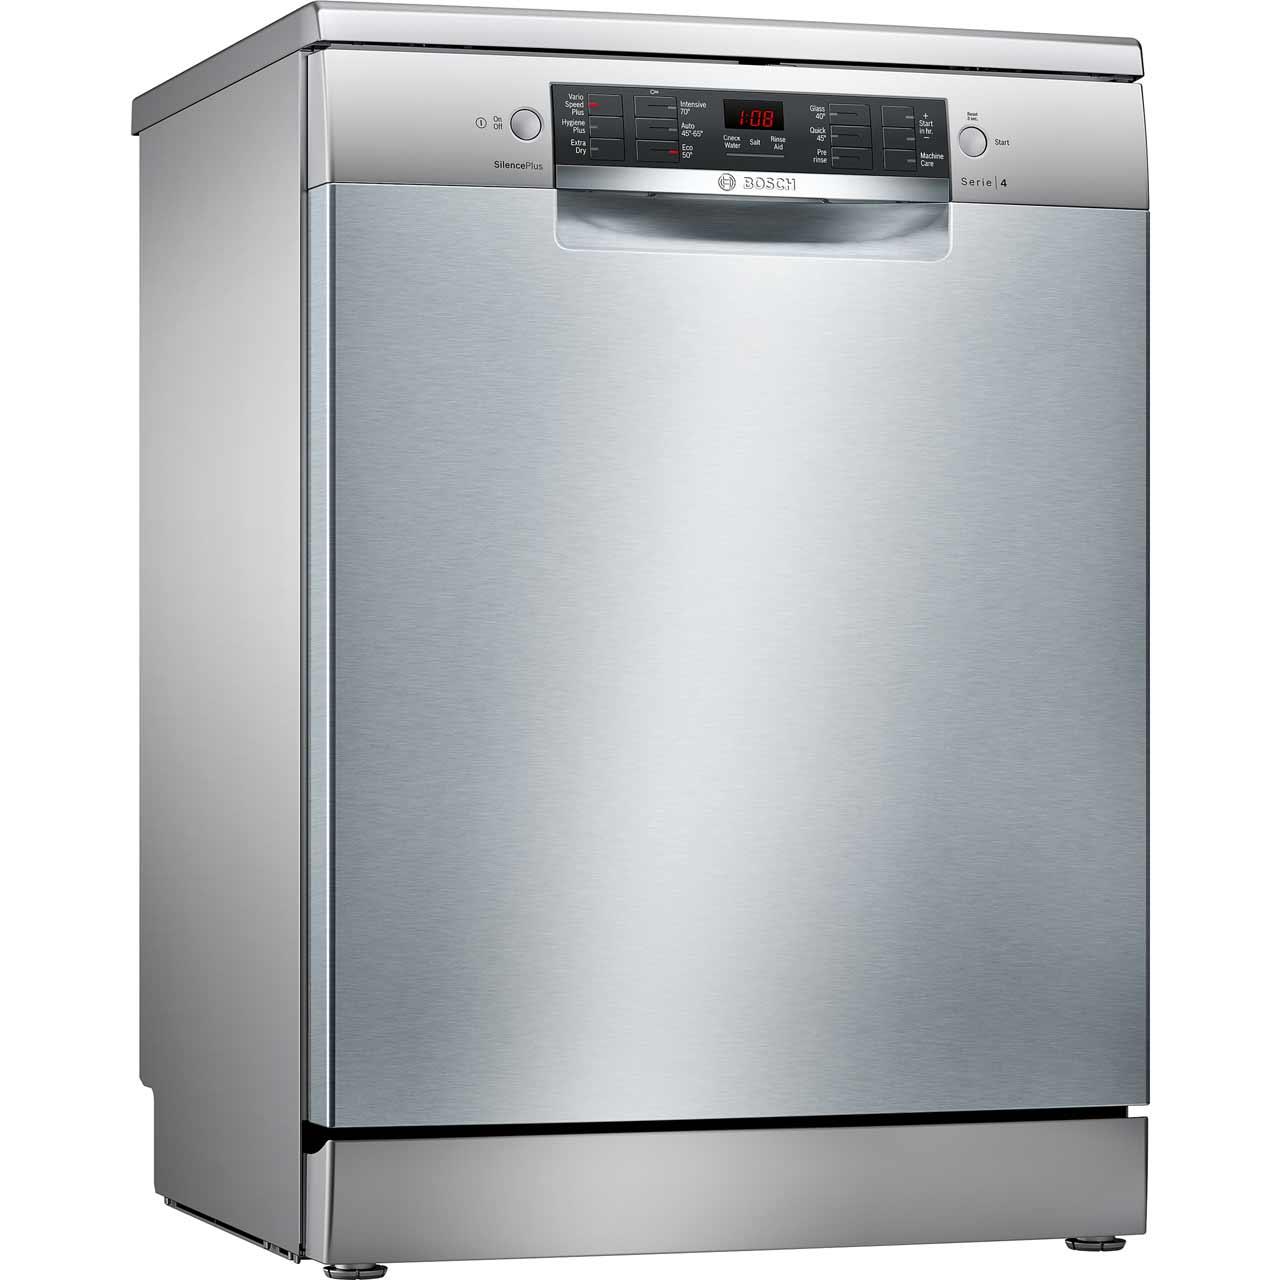 SMS46II00G_SI | Bosch Serie 6 Dishwasher | Silver | ao.com